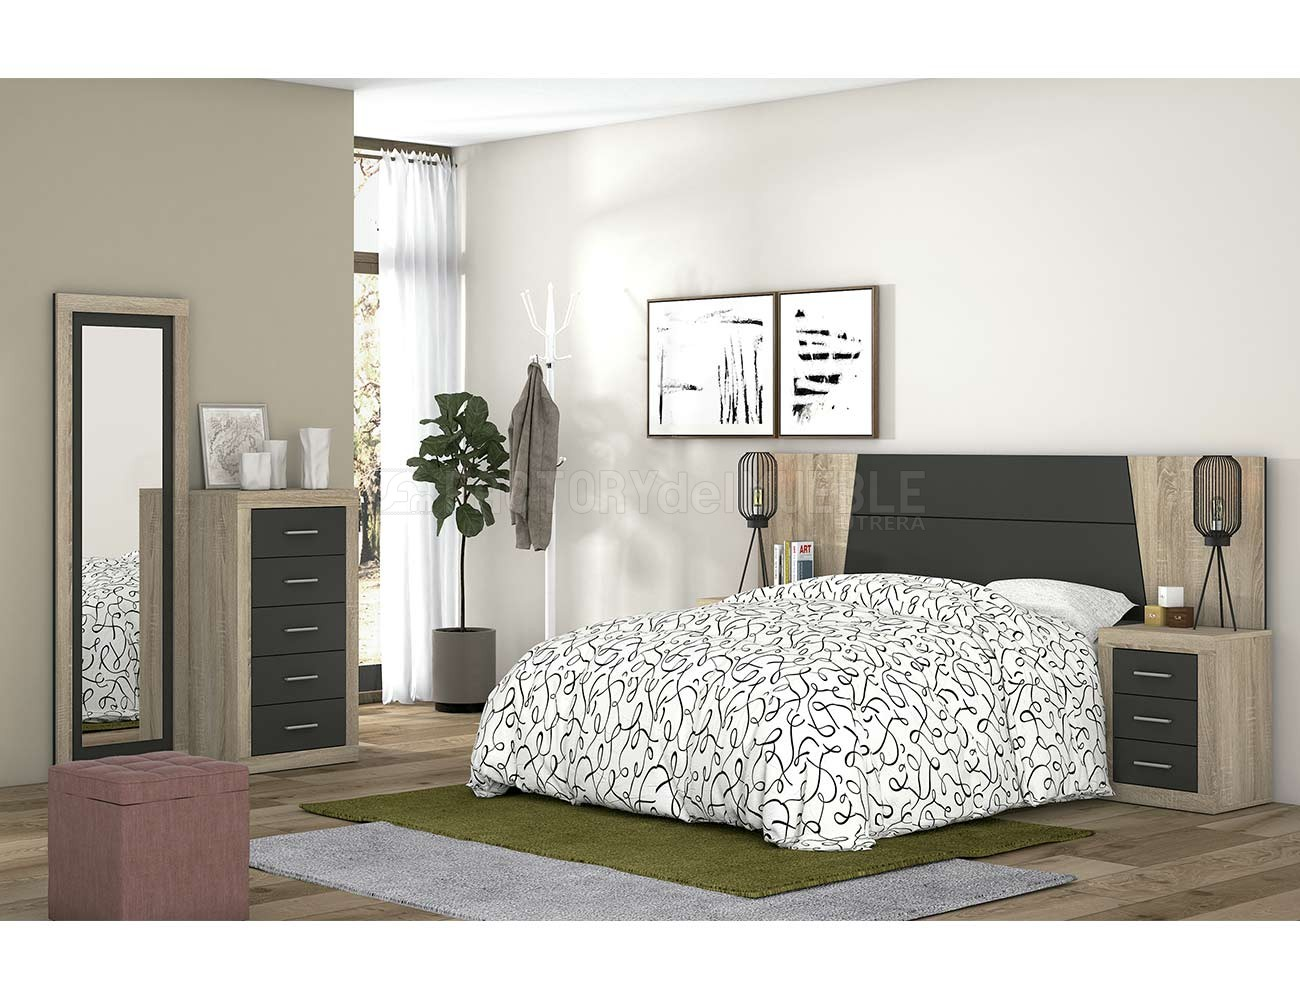 Dormitorio moderno 441